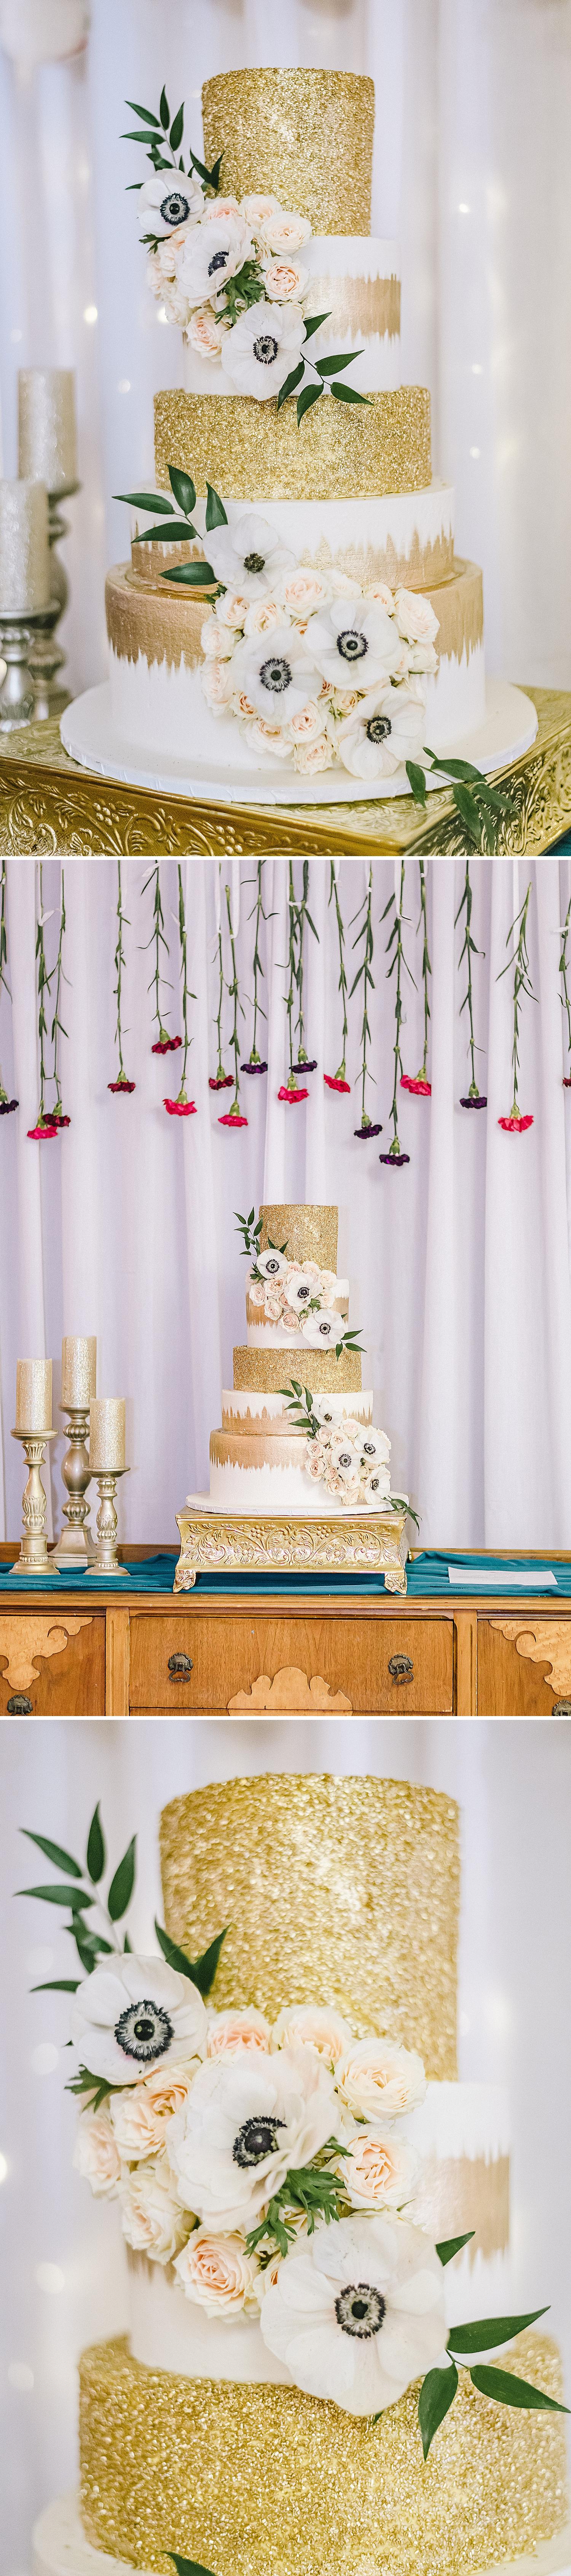 Jewel-Tone-Texas-Wedding-Valerie-Jason-Carly-Barton-Photography_0014.jpg